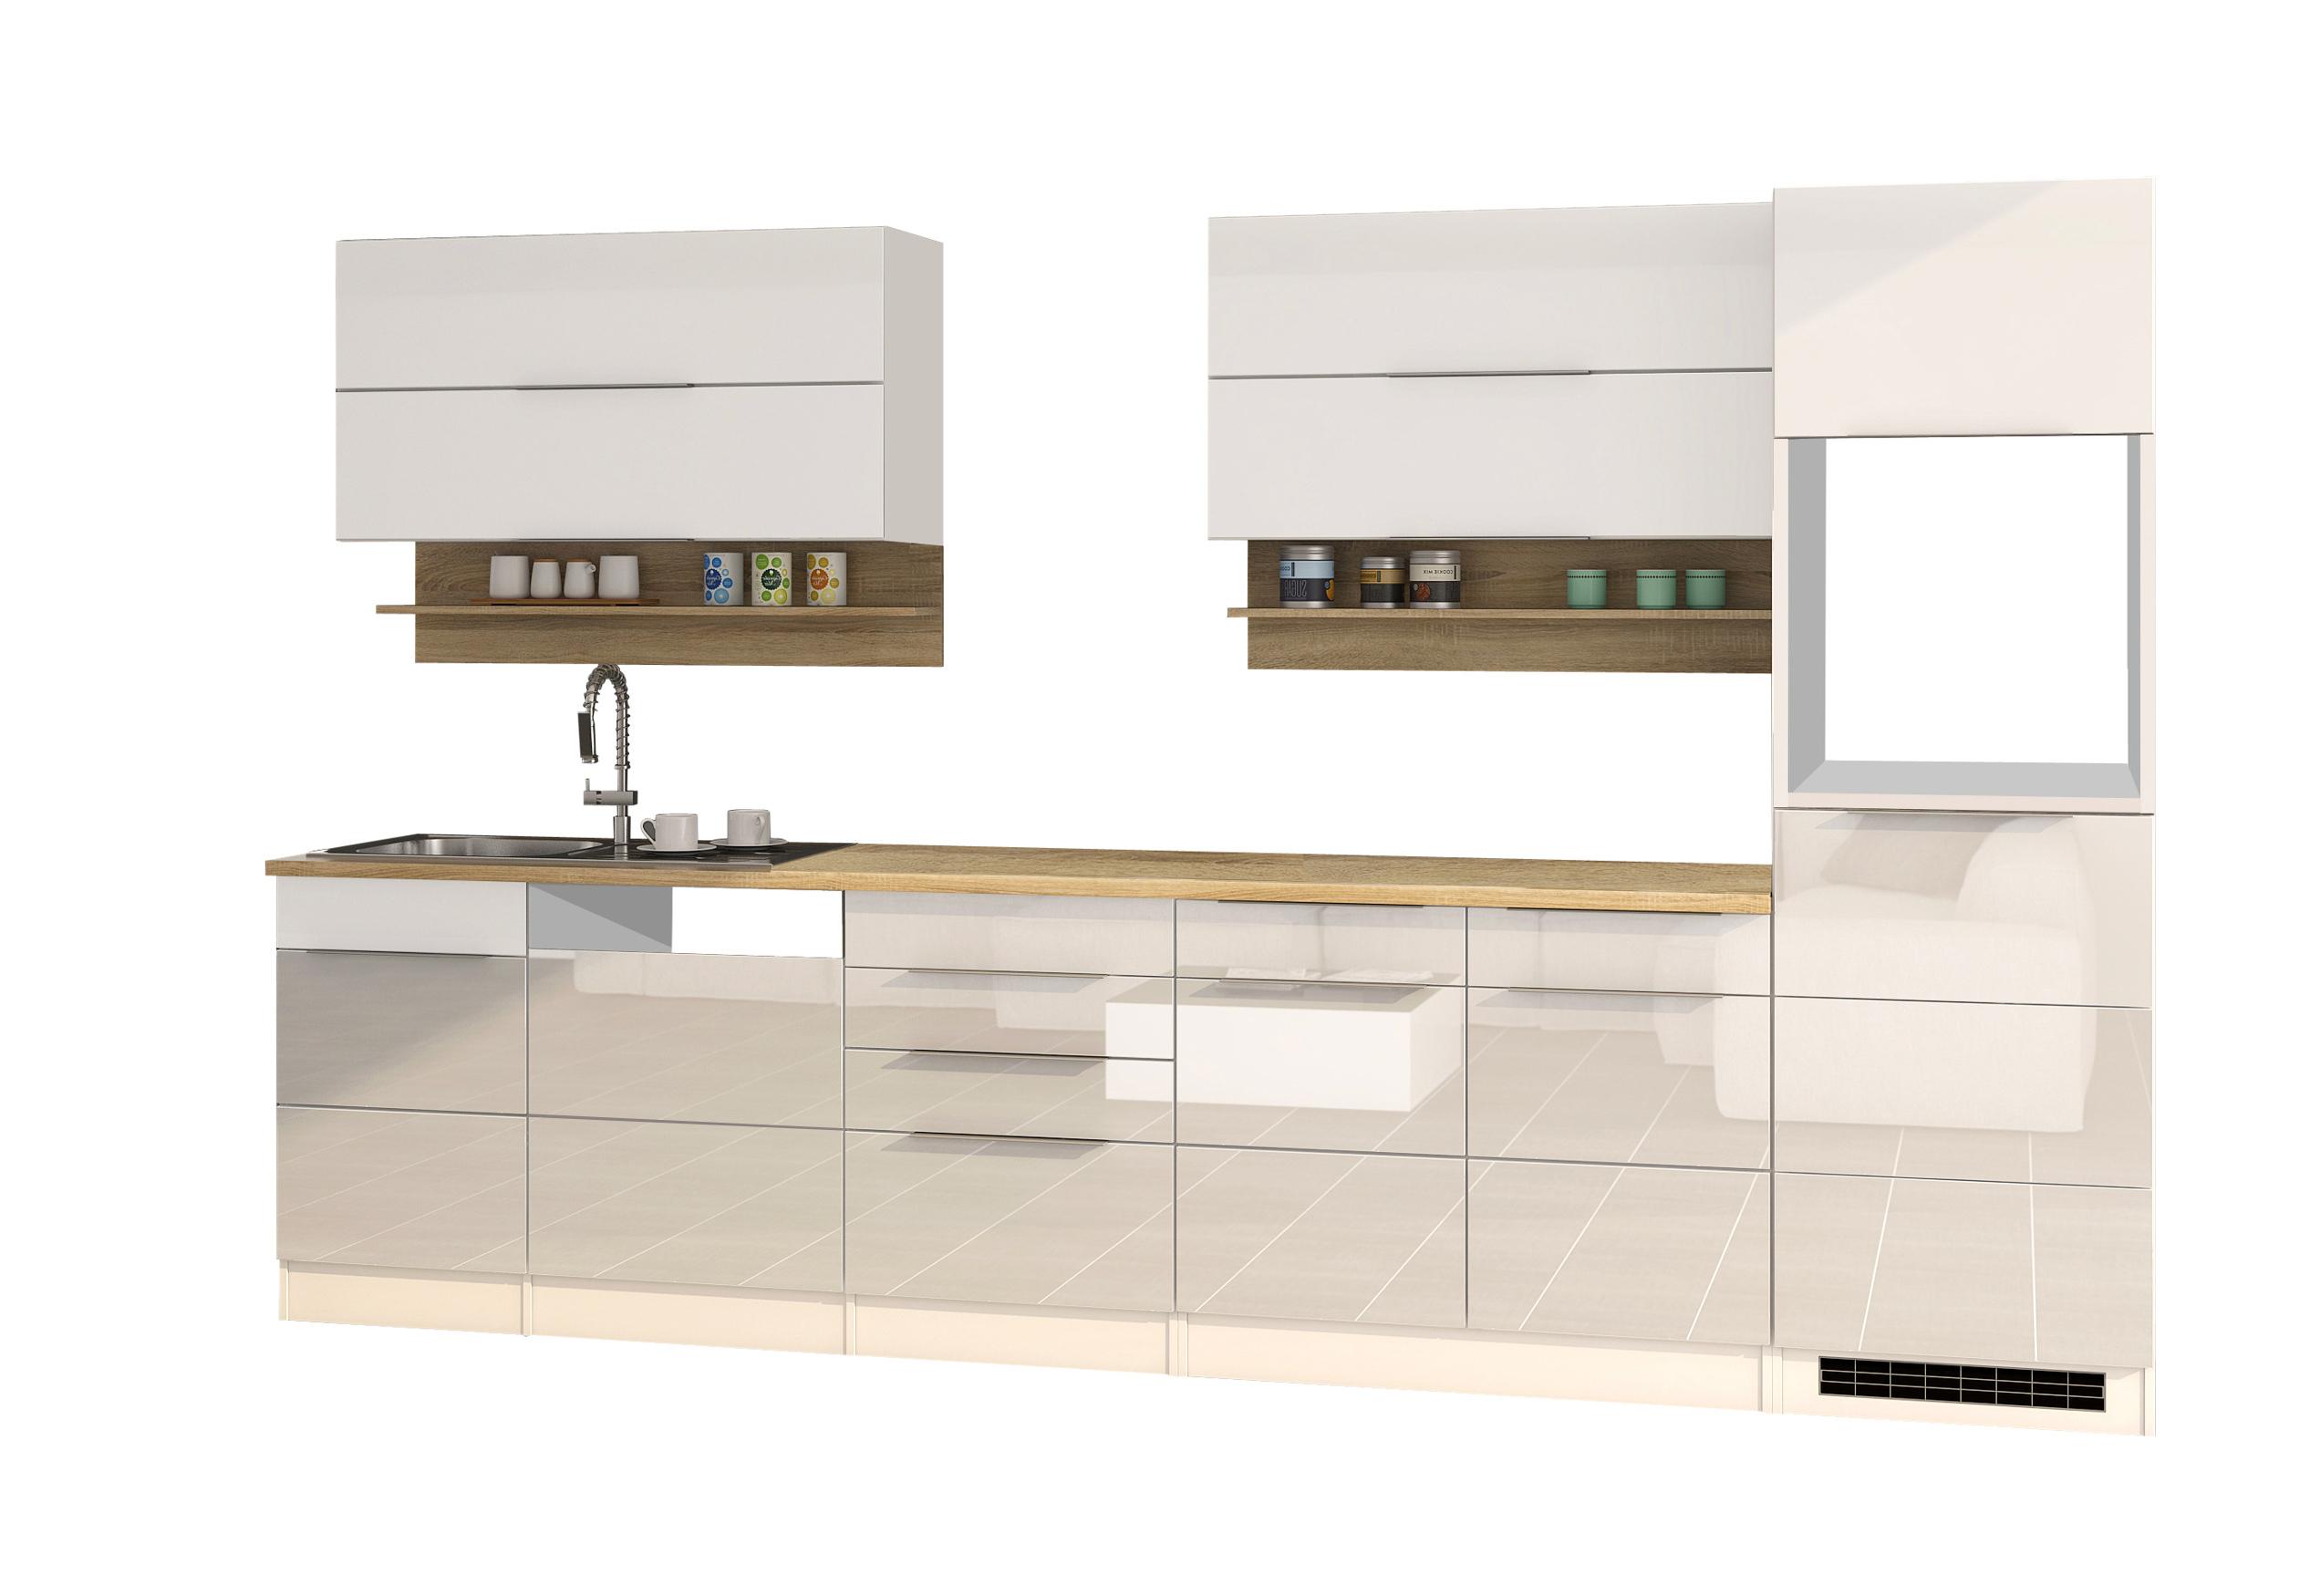 Full Size of Komplette Küche Ohne Elektrogeräte Ikea Küche Ohne Elektrogeräte Was Kostet Eine Küche Ohne Elektrogeräte Küche Ohne Elektrogeräte Kaufen Küche Küche Ohne Elektrogeräte